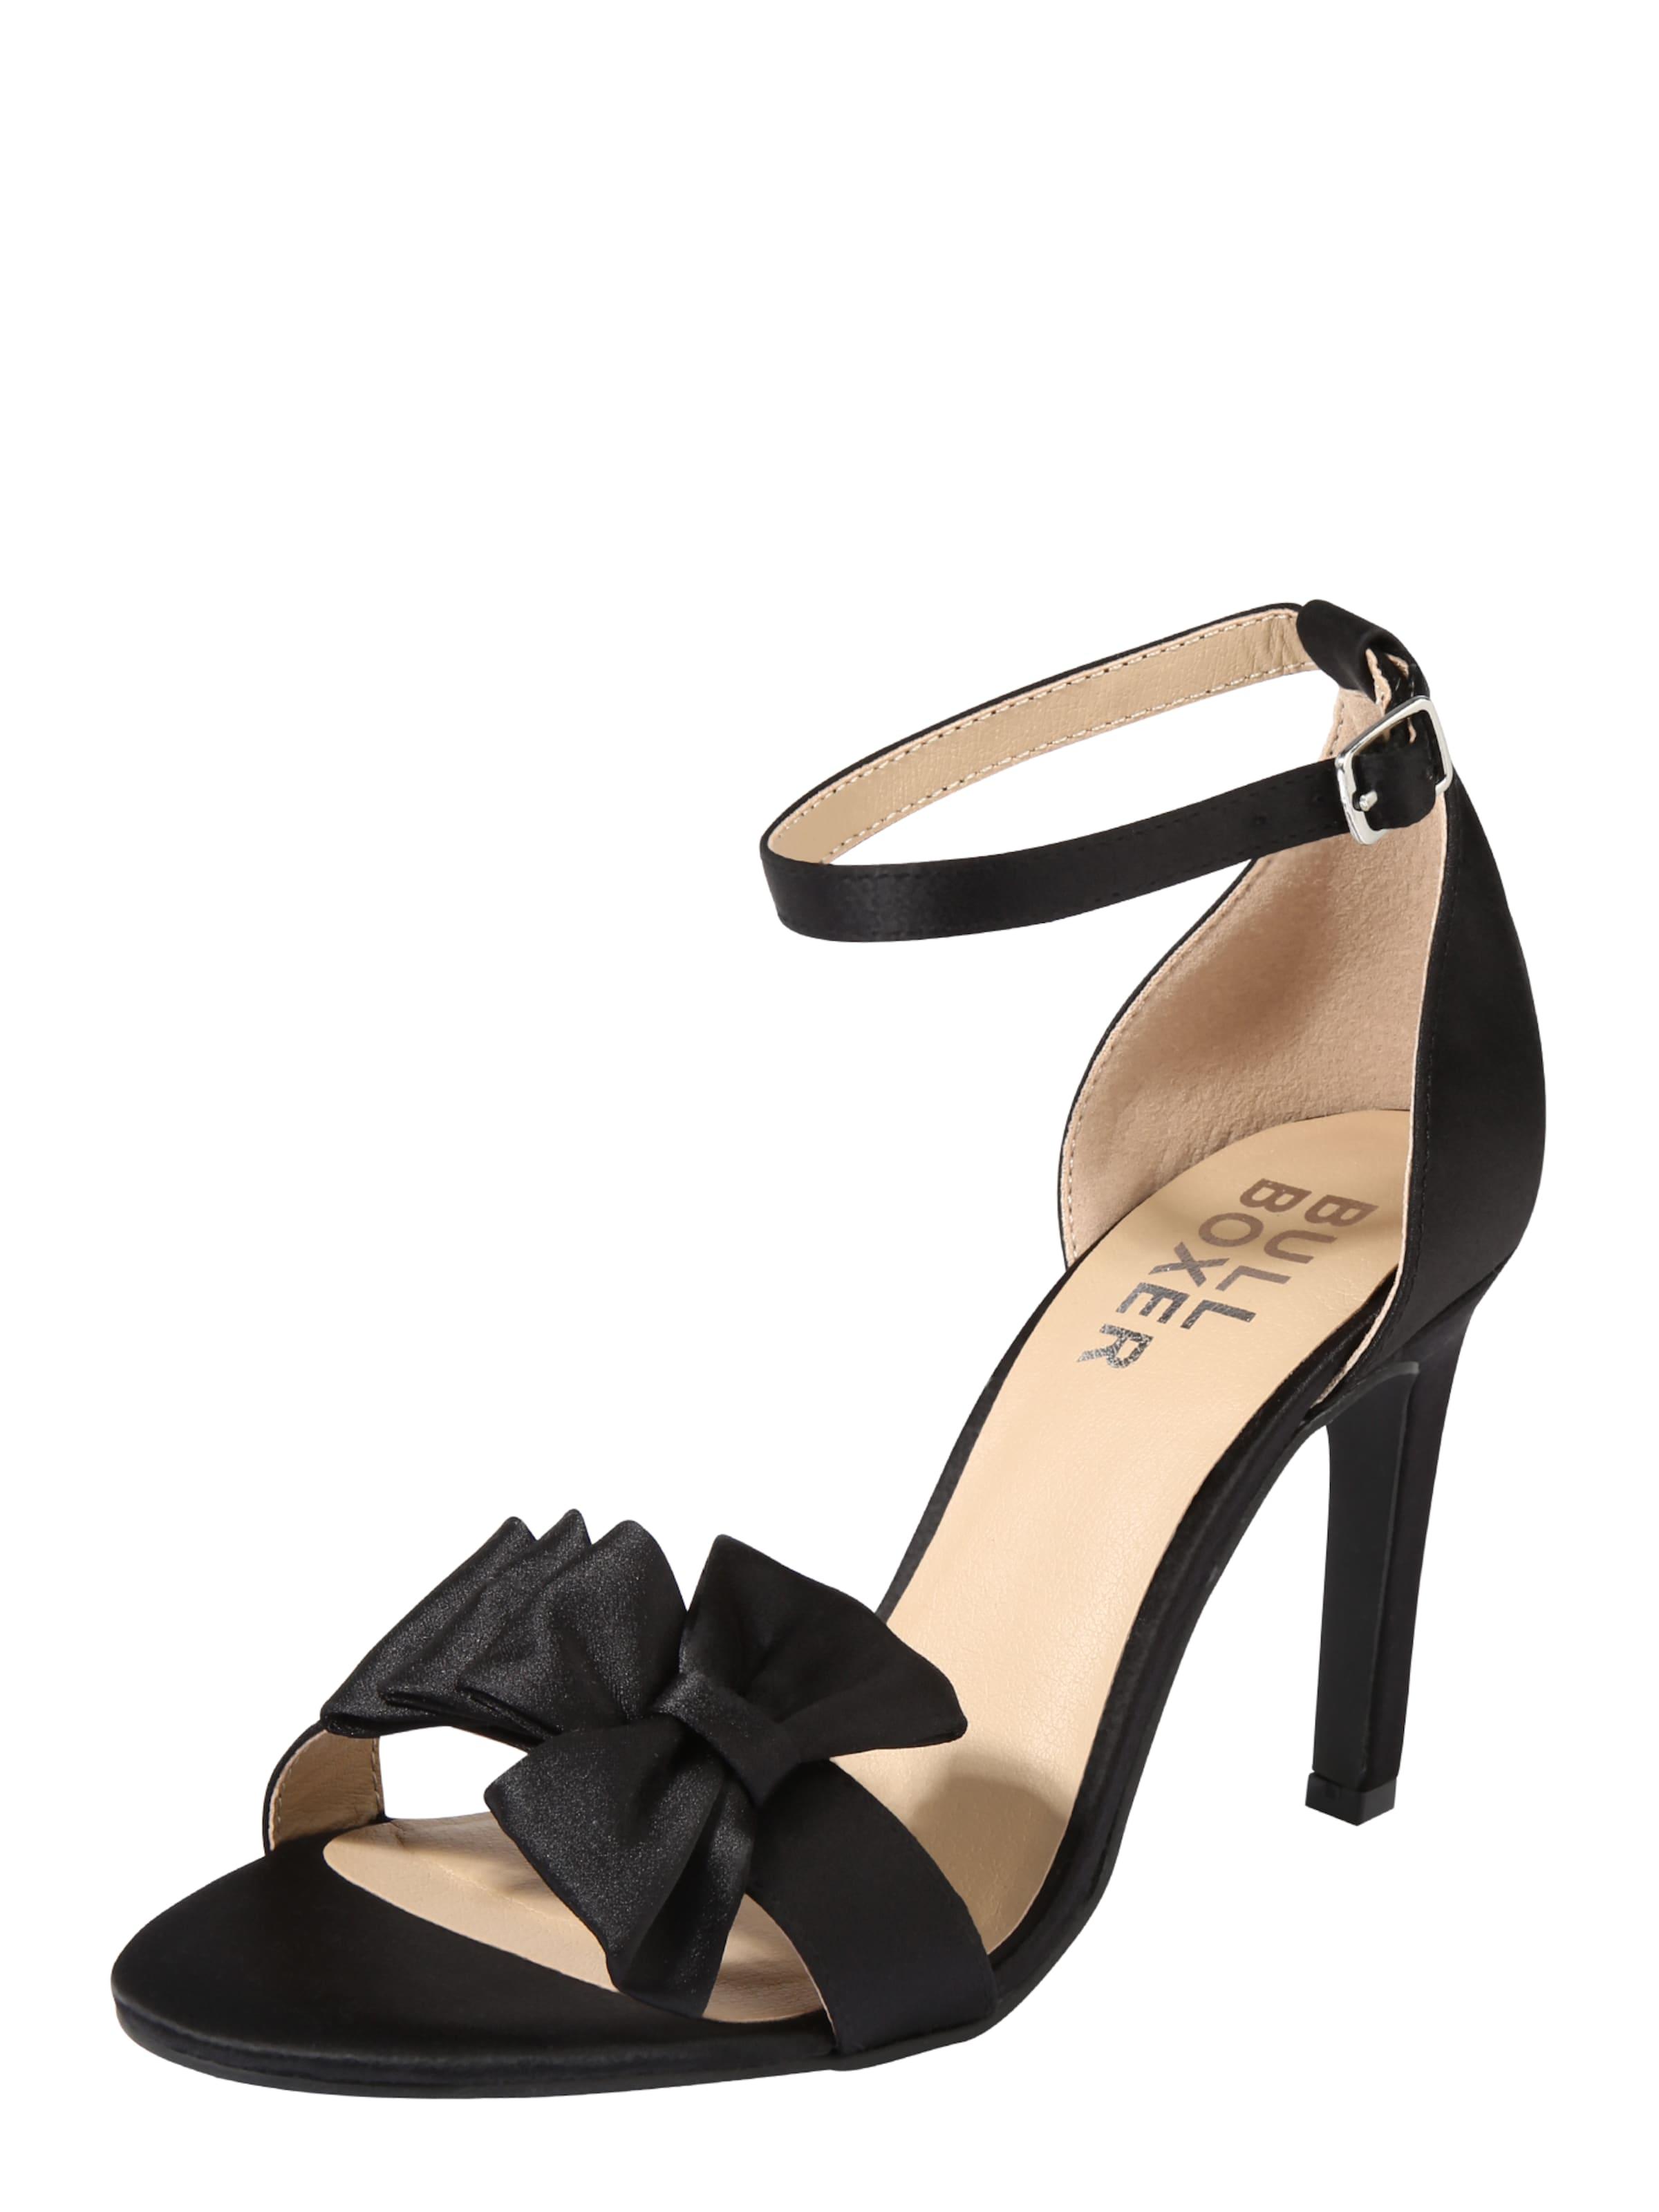 Haltbare Mode billige Schuhe BULLBOXER BULLBOXER BULLBOXER   Riemchensandalette Schuhe Gut getragene Schuhe 5b81a1